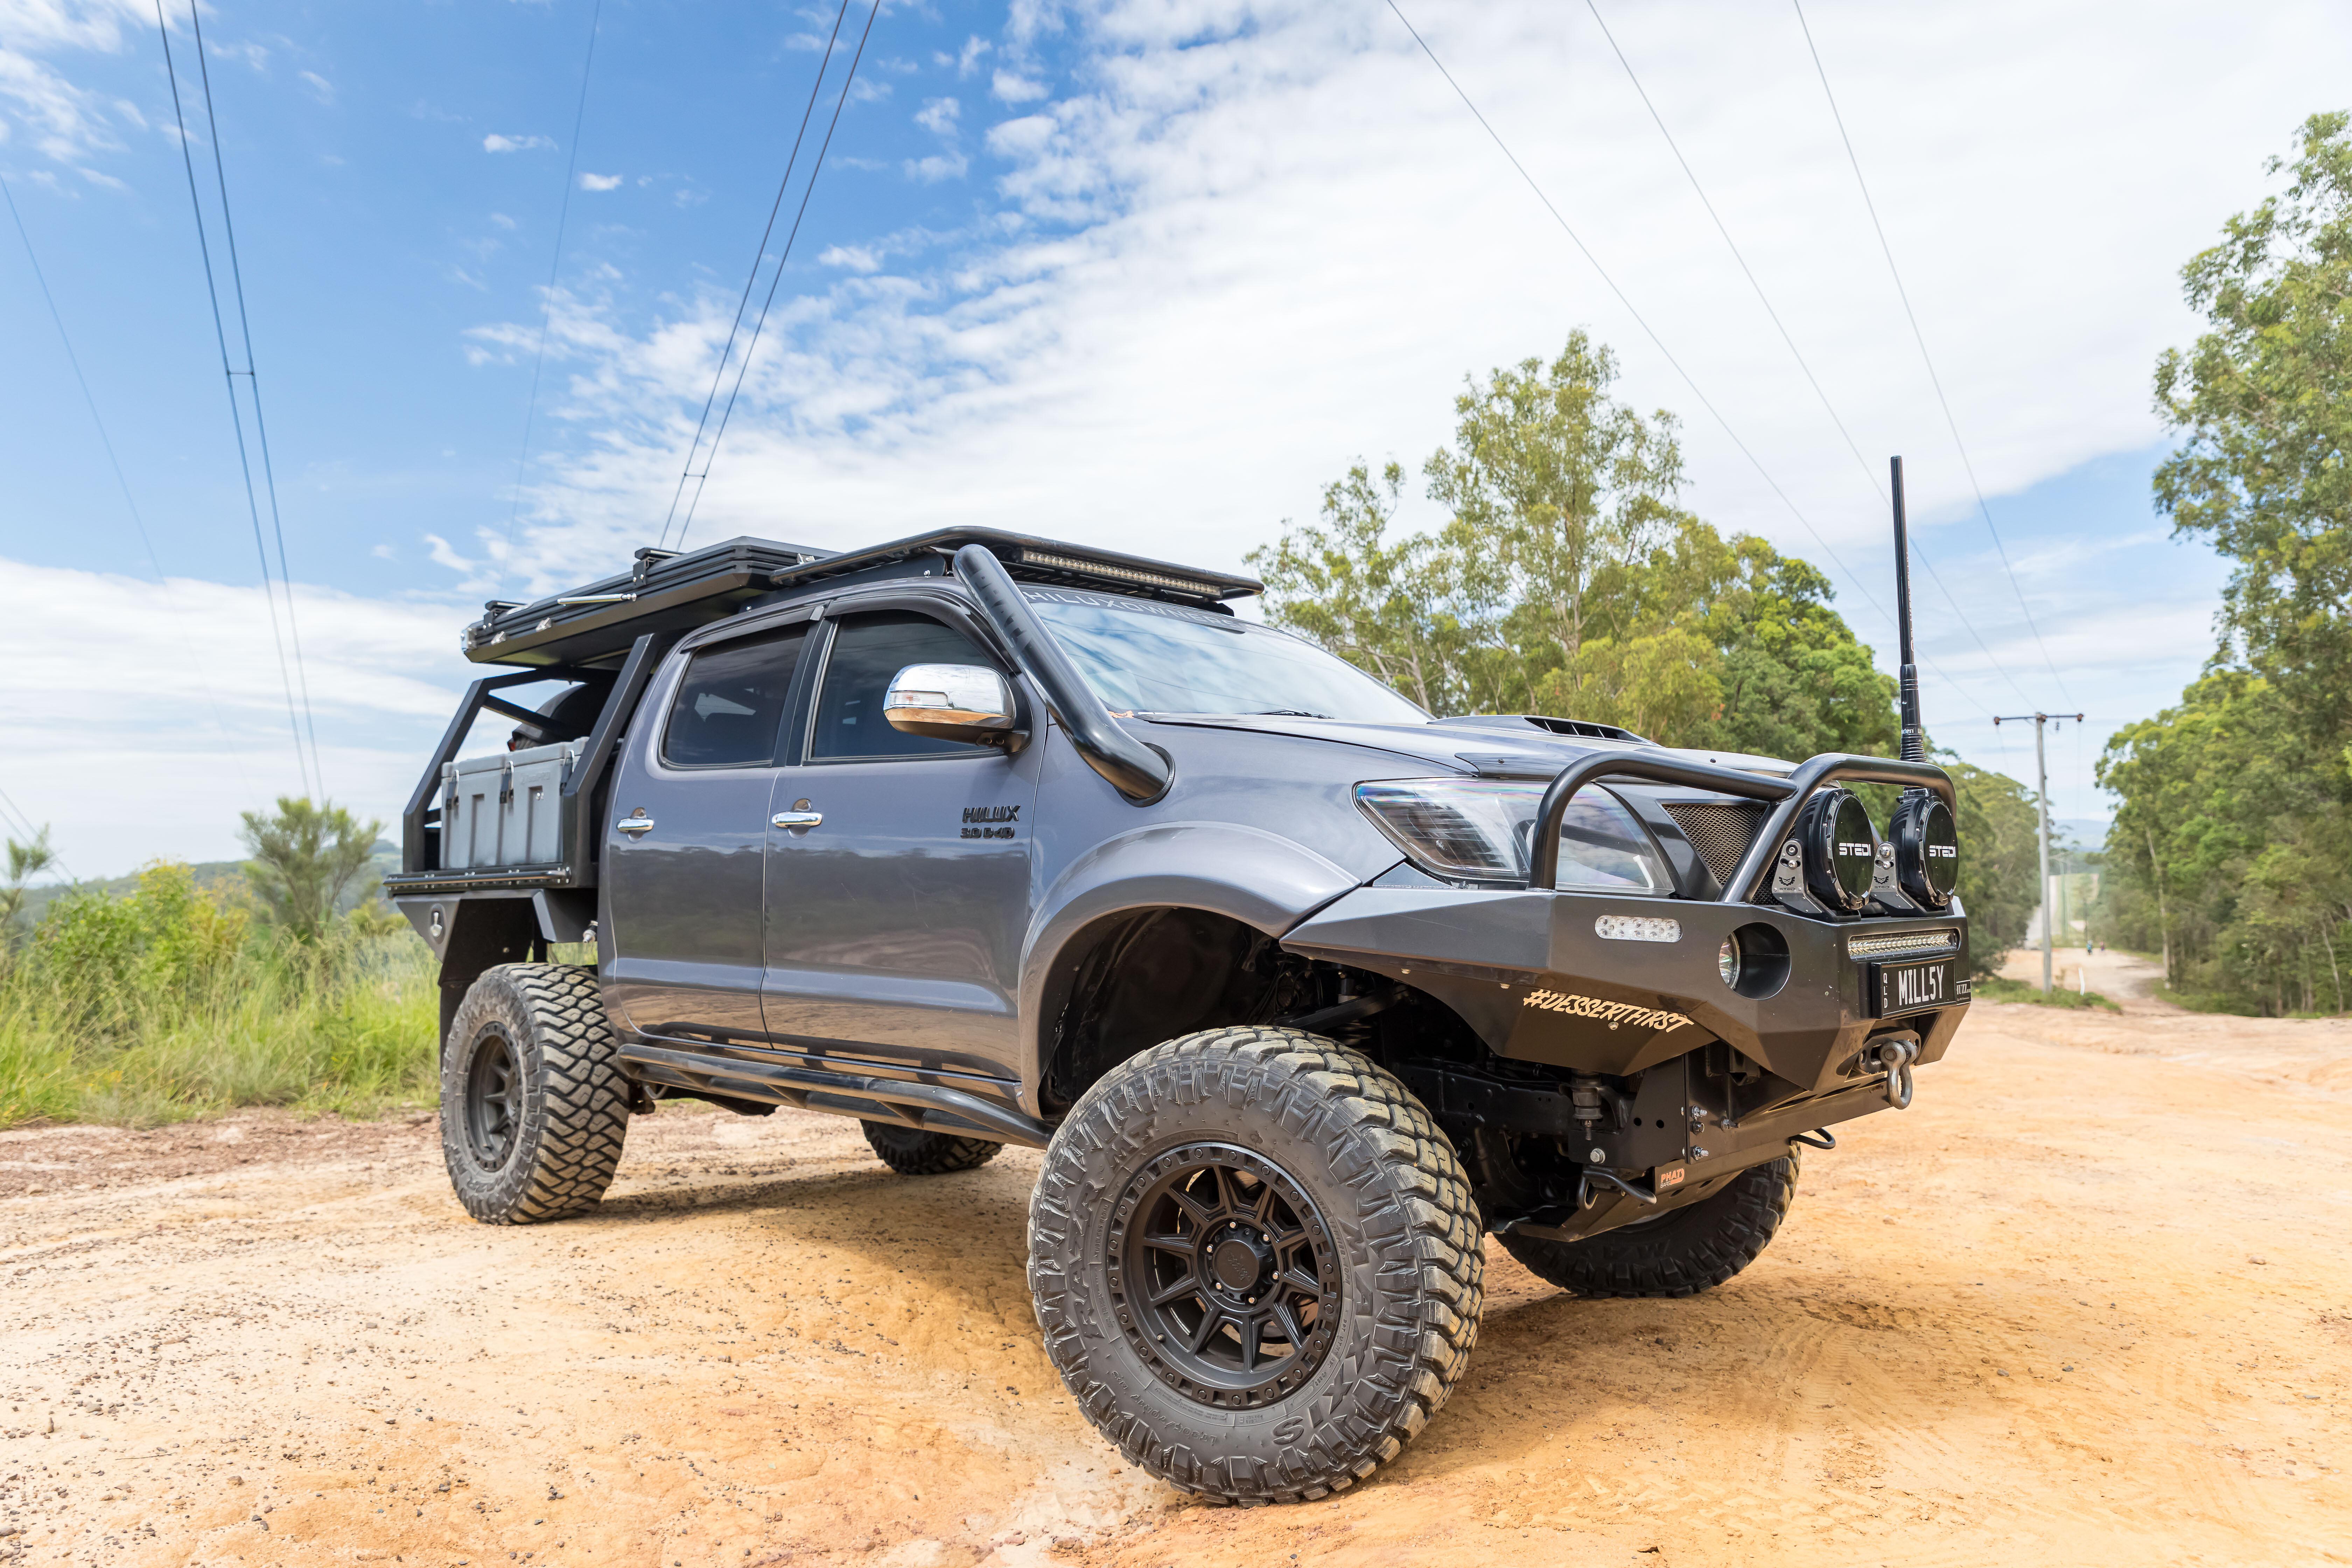 4 X 4 Australia Miscellaneous Custom Toyota Hilux N 70